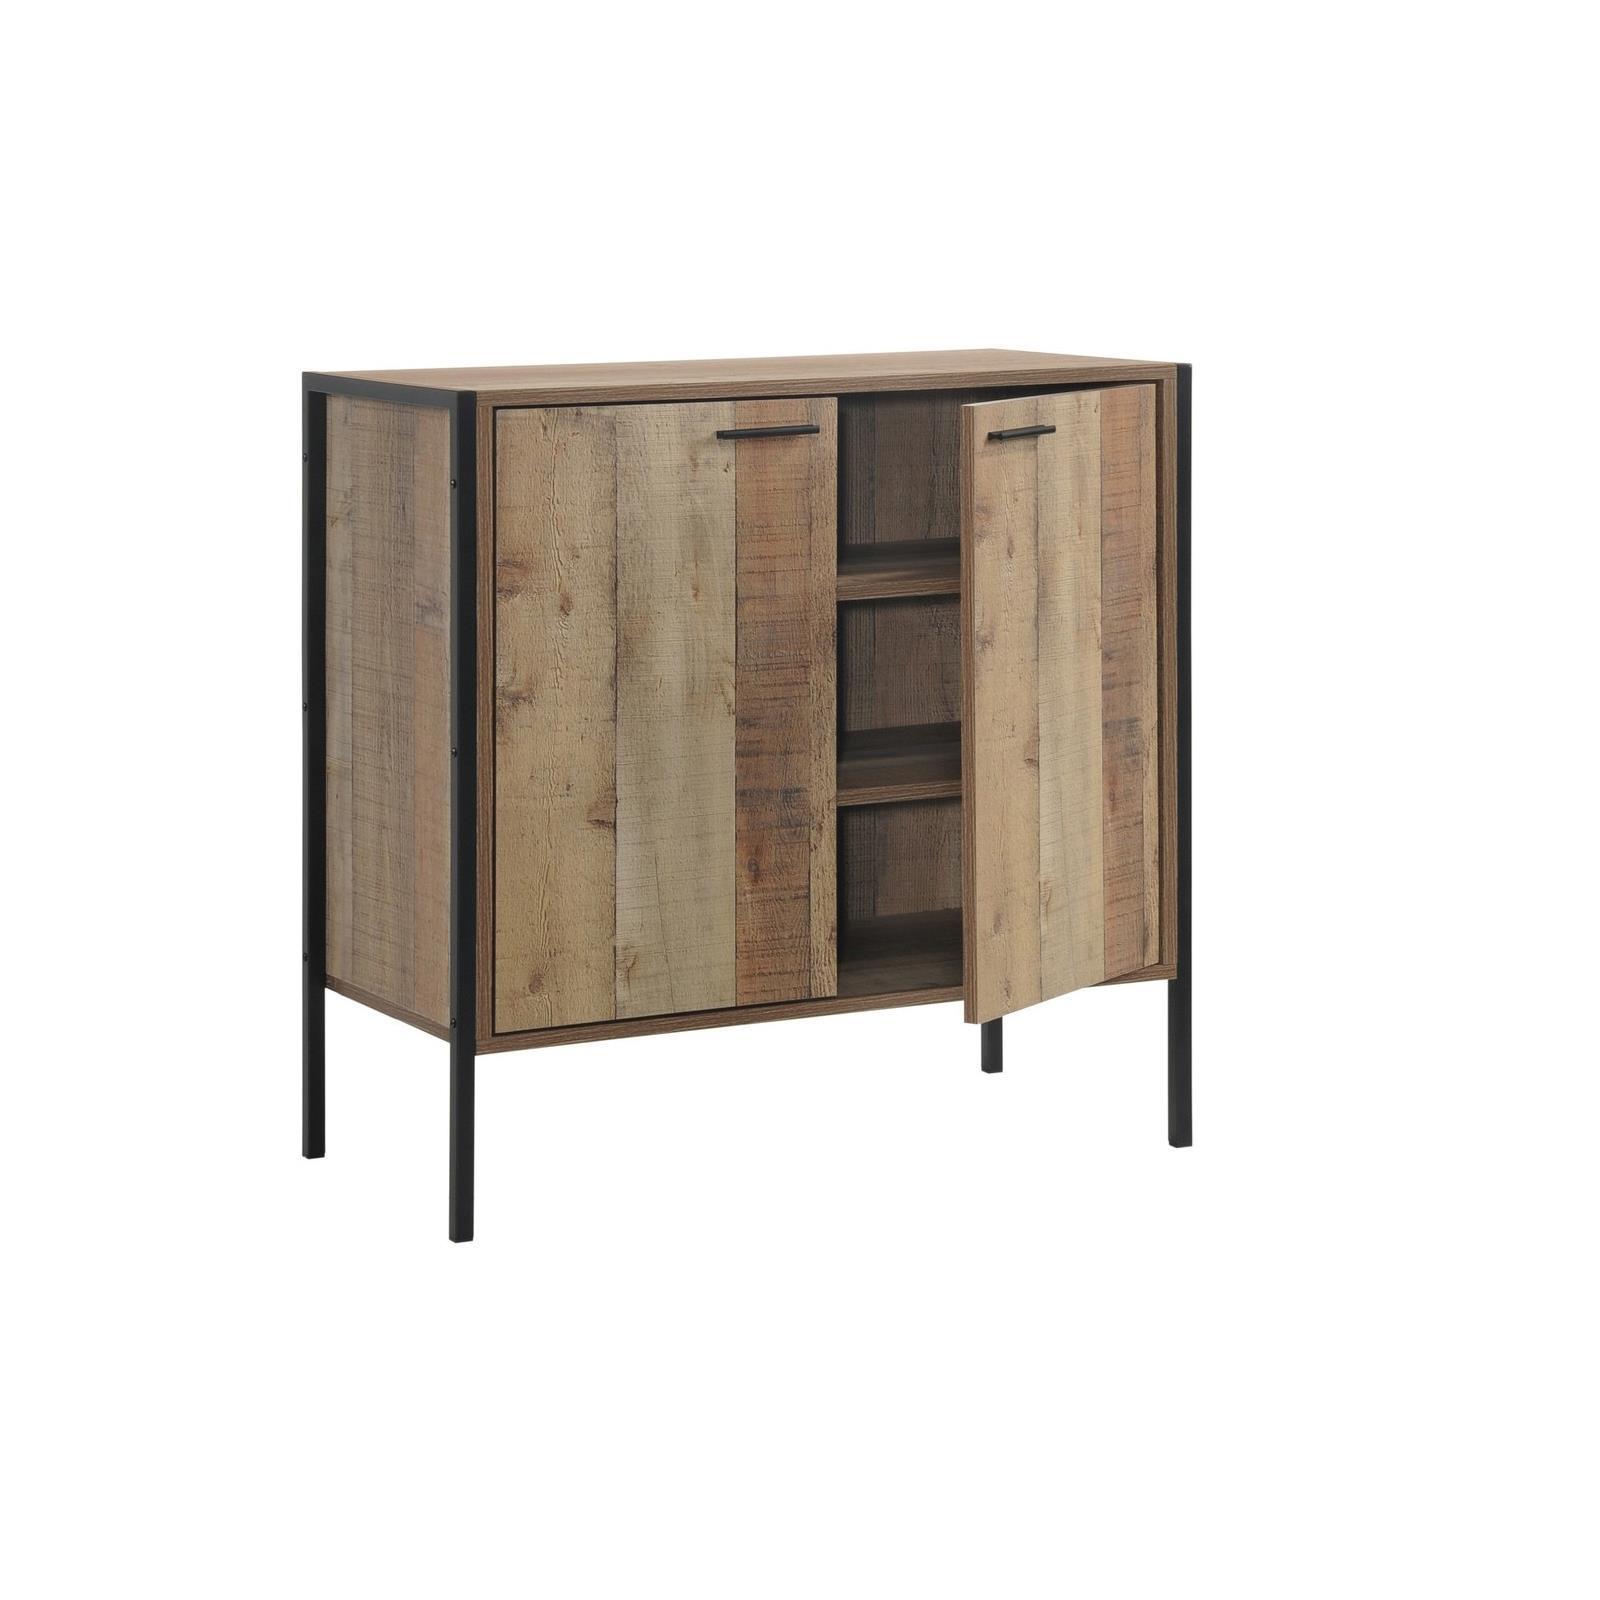 PALLET παπουτσοθήκη-ντουλάπι με 3 ράφια antique oak Υ80x40x40εκ.